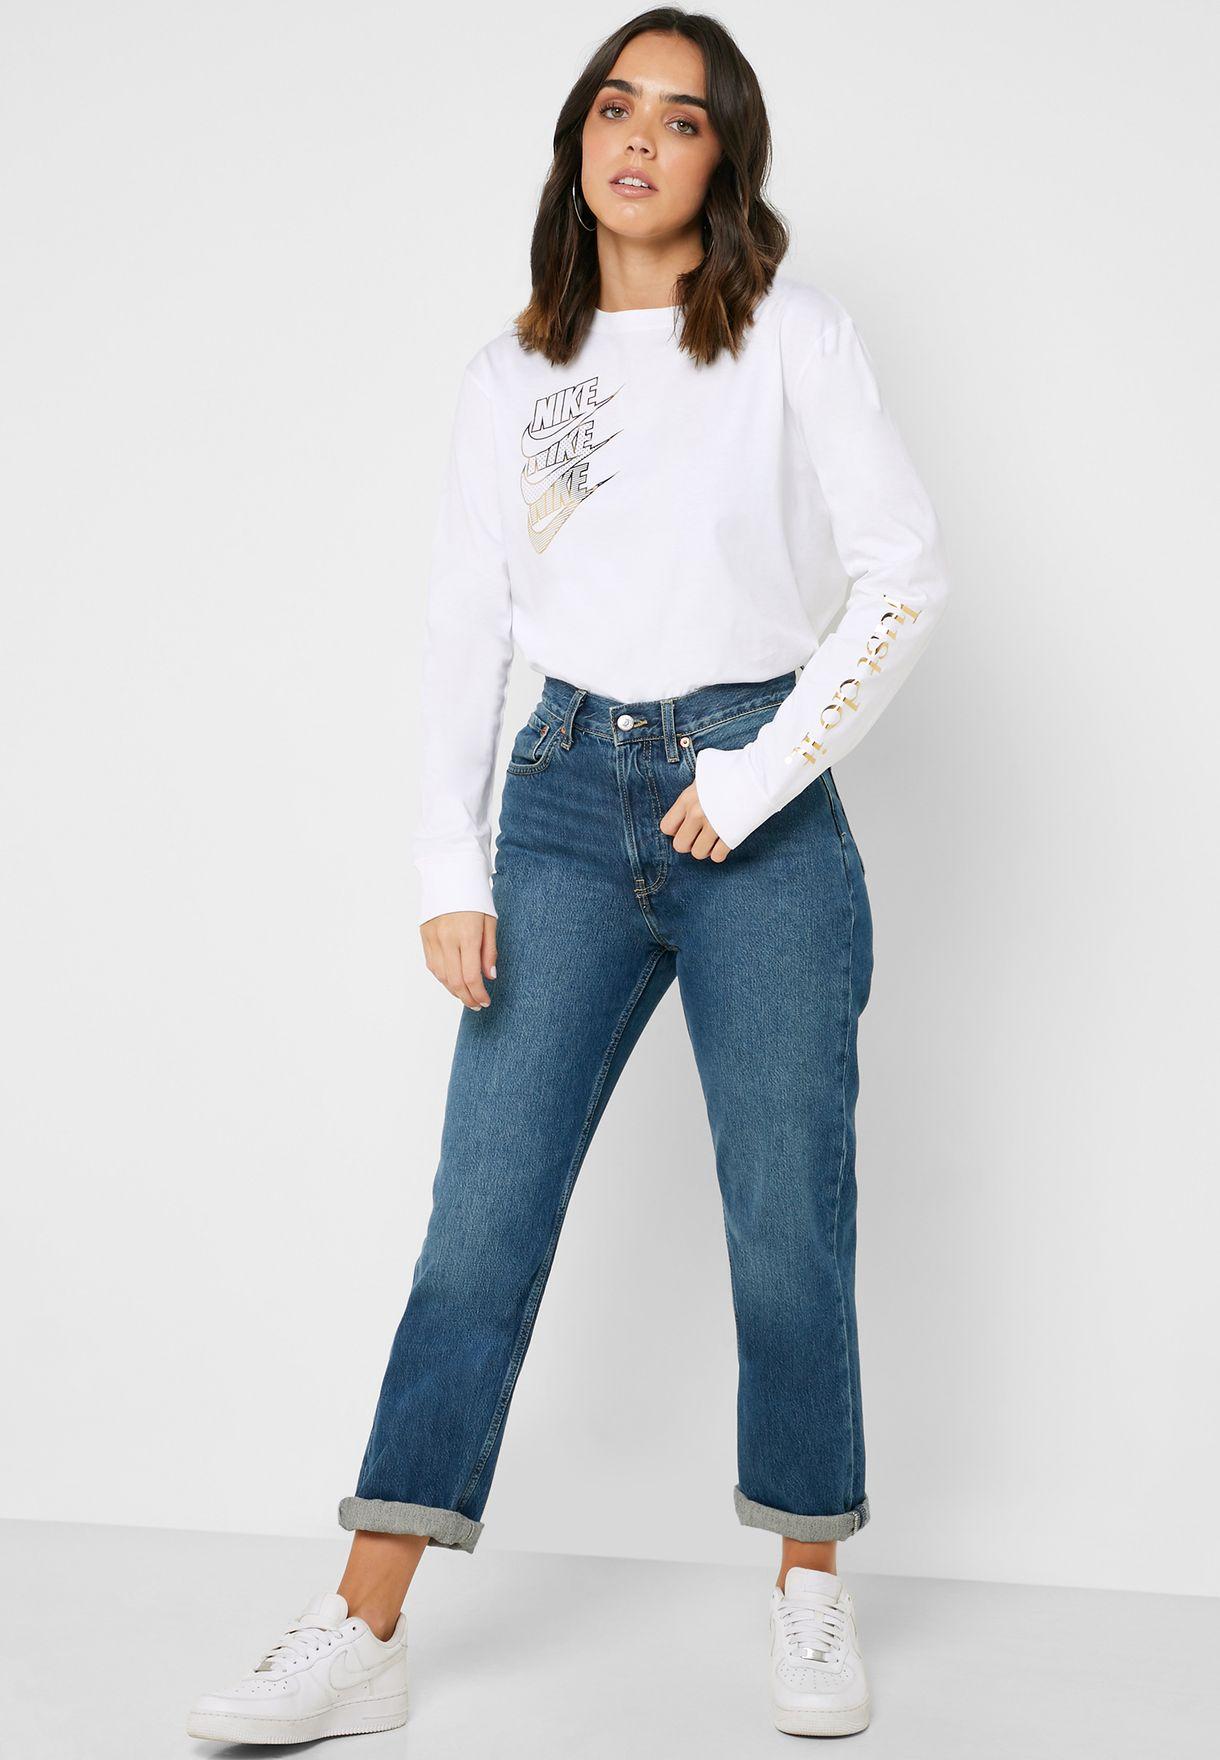 NSW Shine T-Shirt